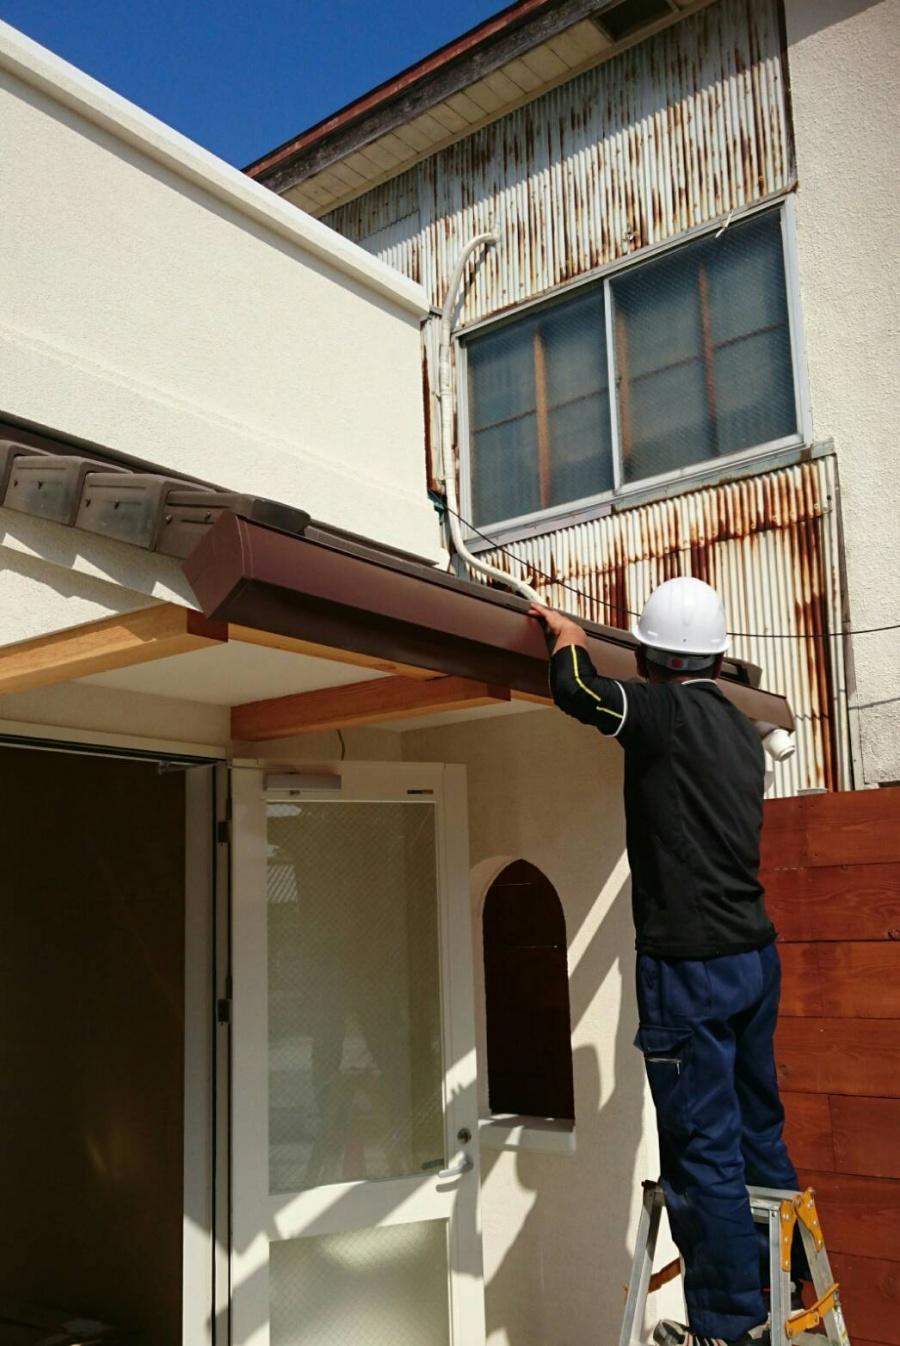 A様邸・A様店舗のポーチ1 ポーチの庇に雨樋を設置する作業